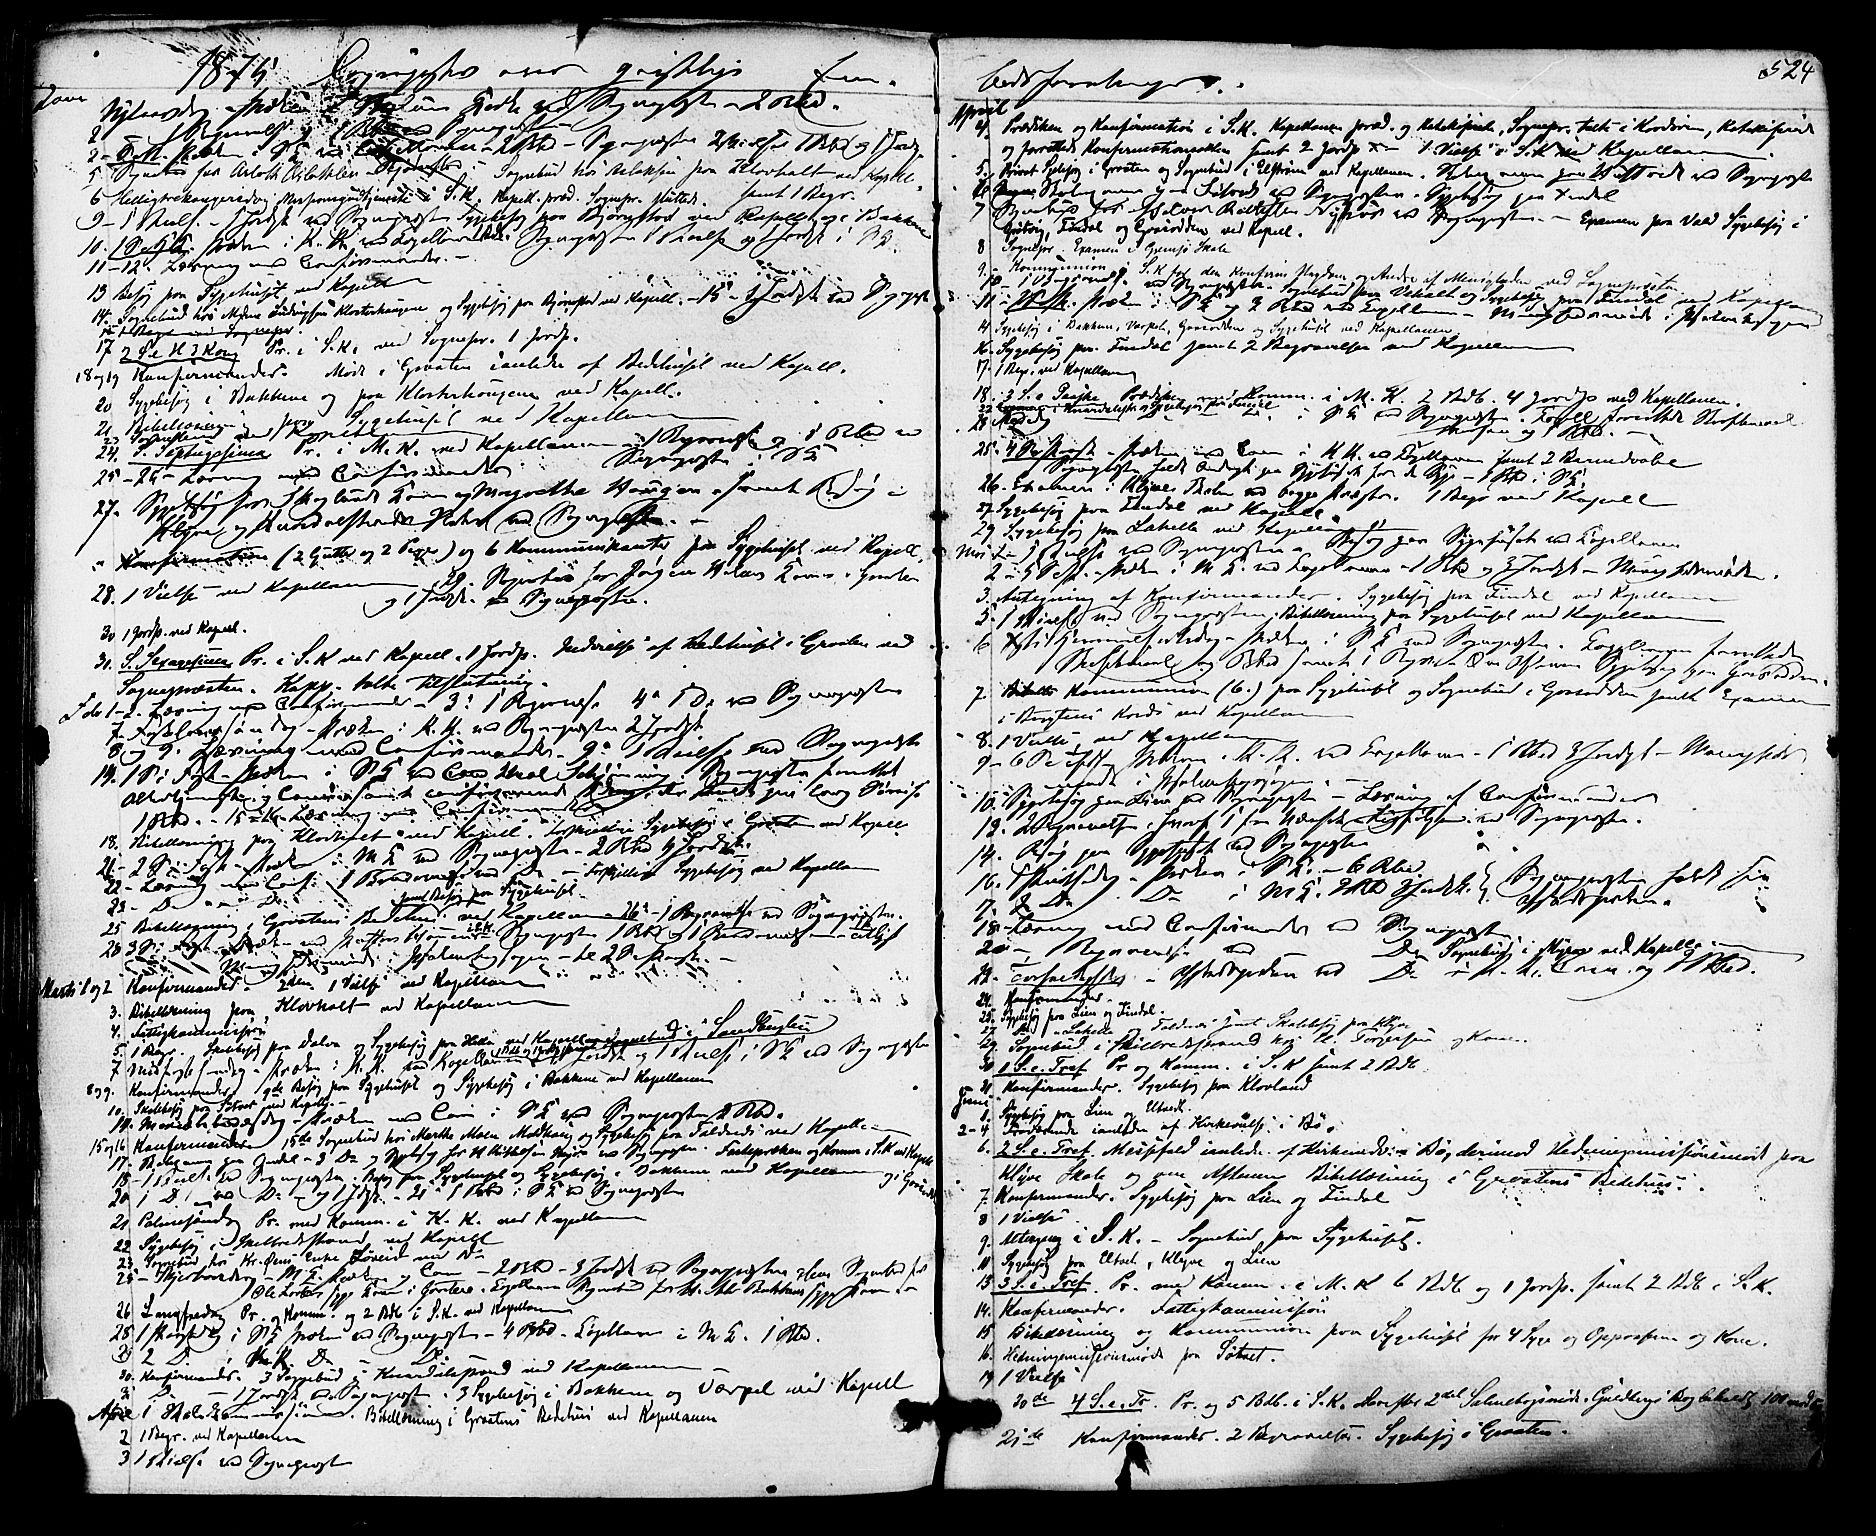 SAKO, Solum kirkebøker, F/Fa/L0008: Ministerialbok nr. I 8, 1865-1876, s. 524